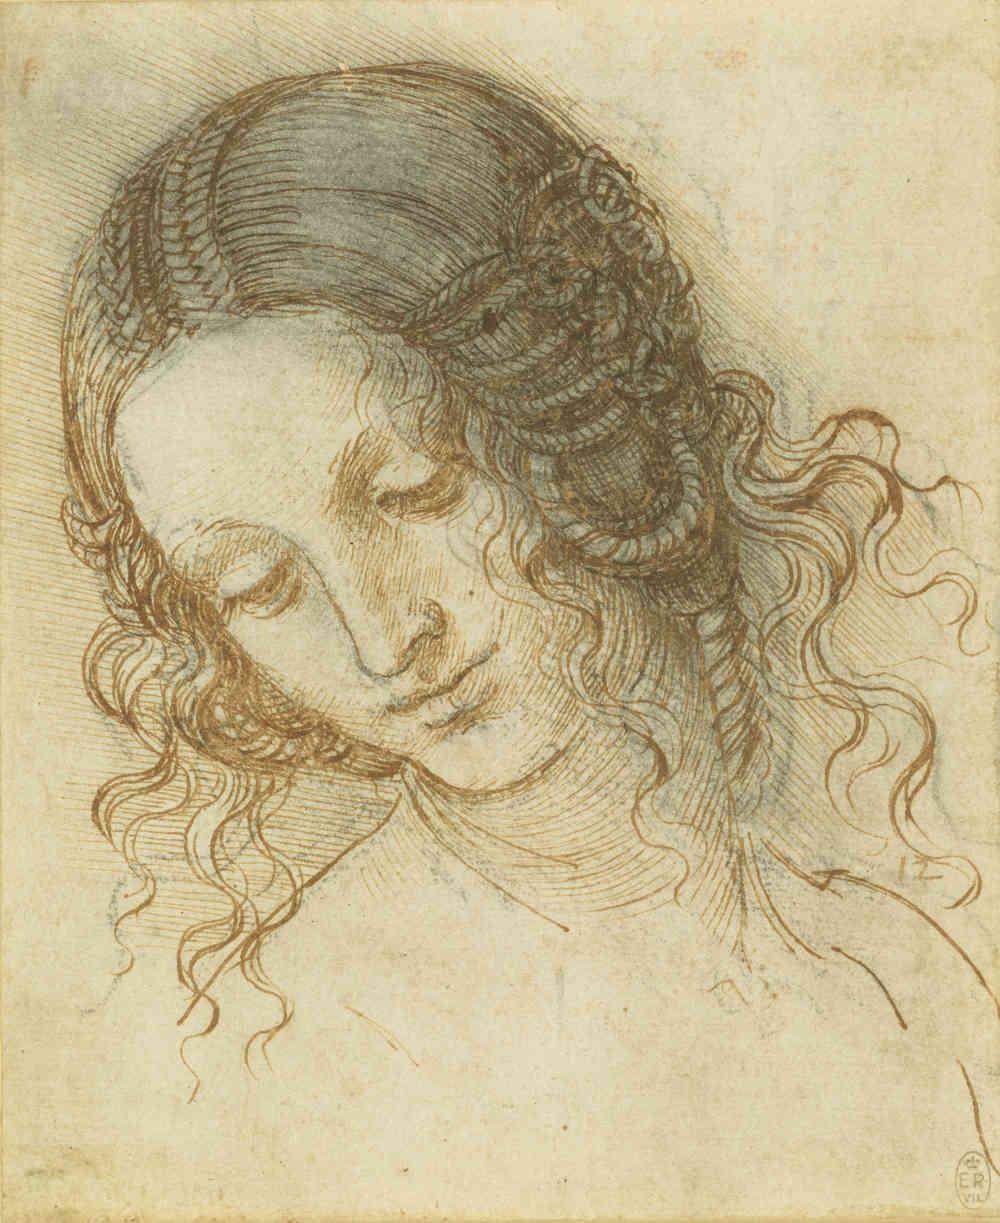 Leonardo, Queen's Gallery, Buckingham Palace